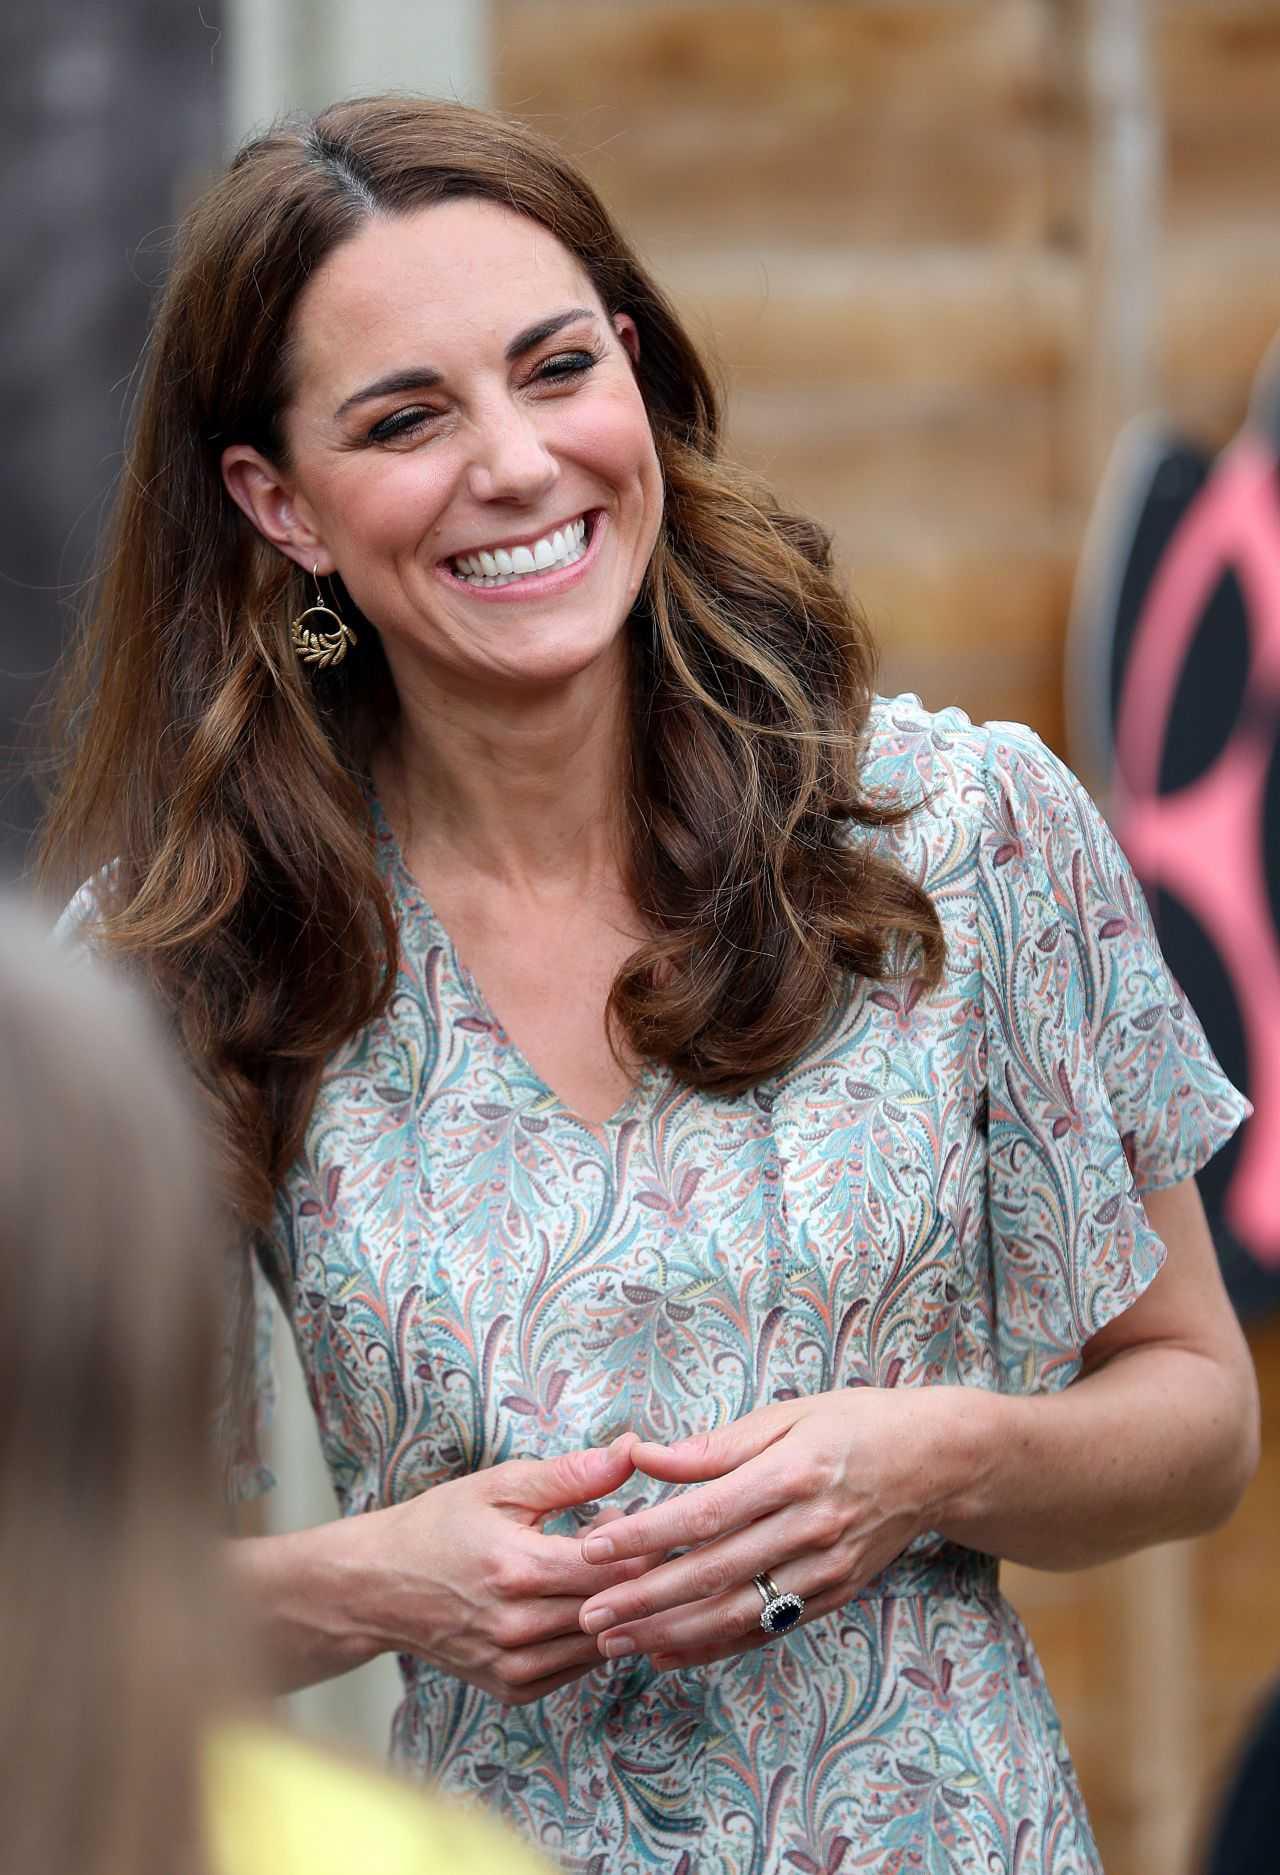 Kate Middleton cleavage'